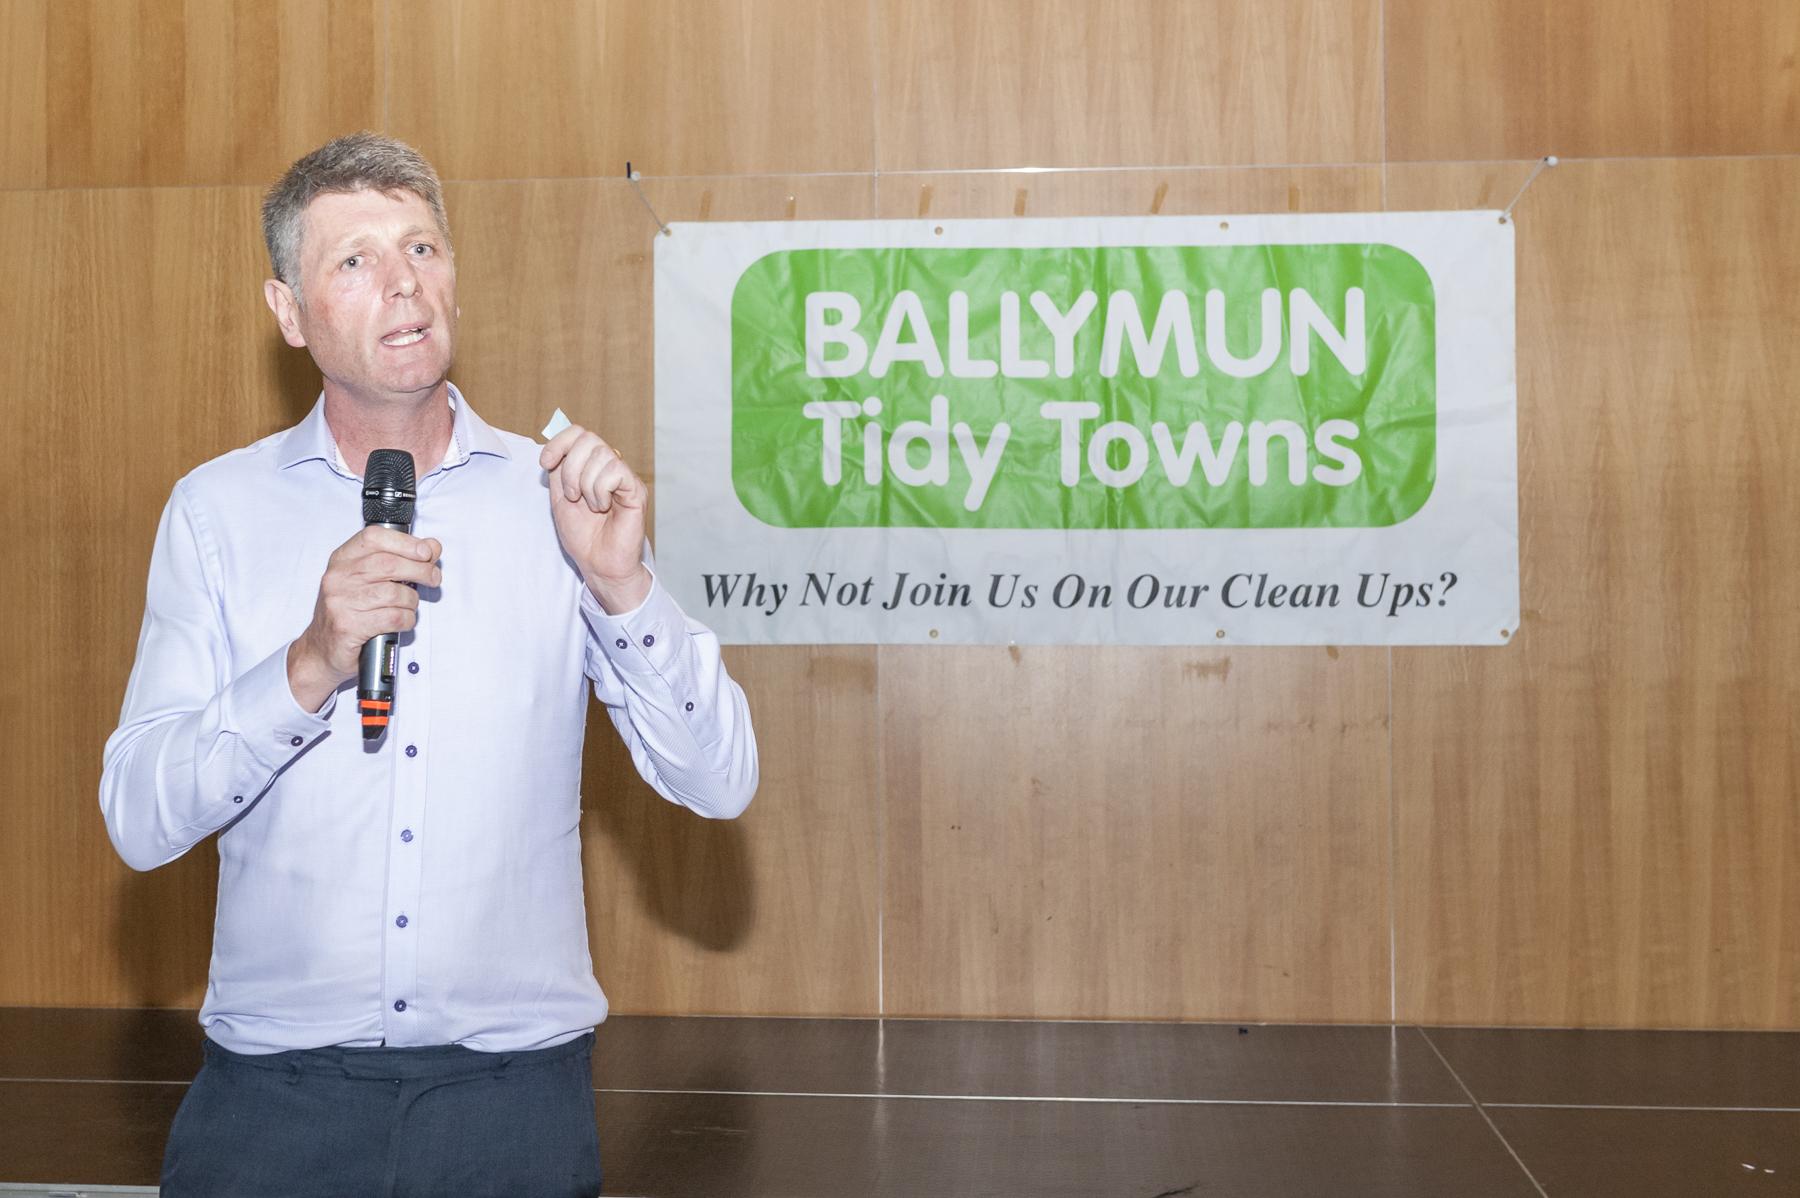 ballymun-tidy-towns-37